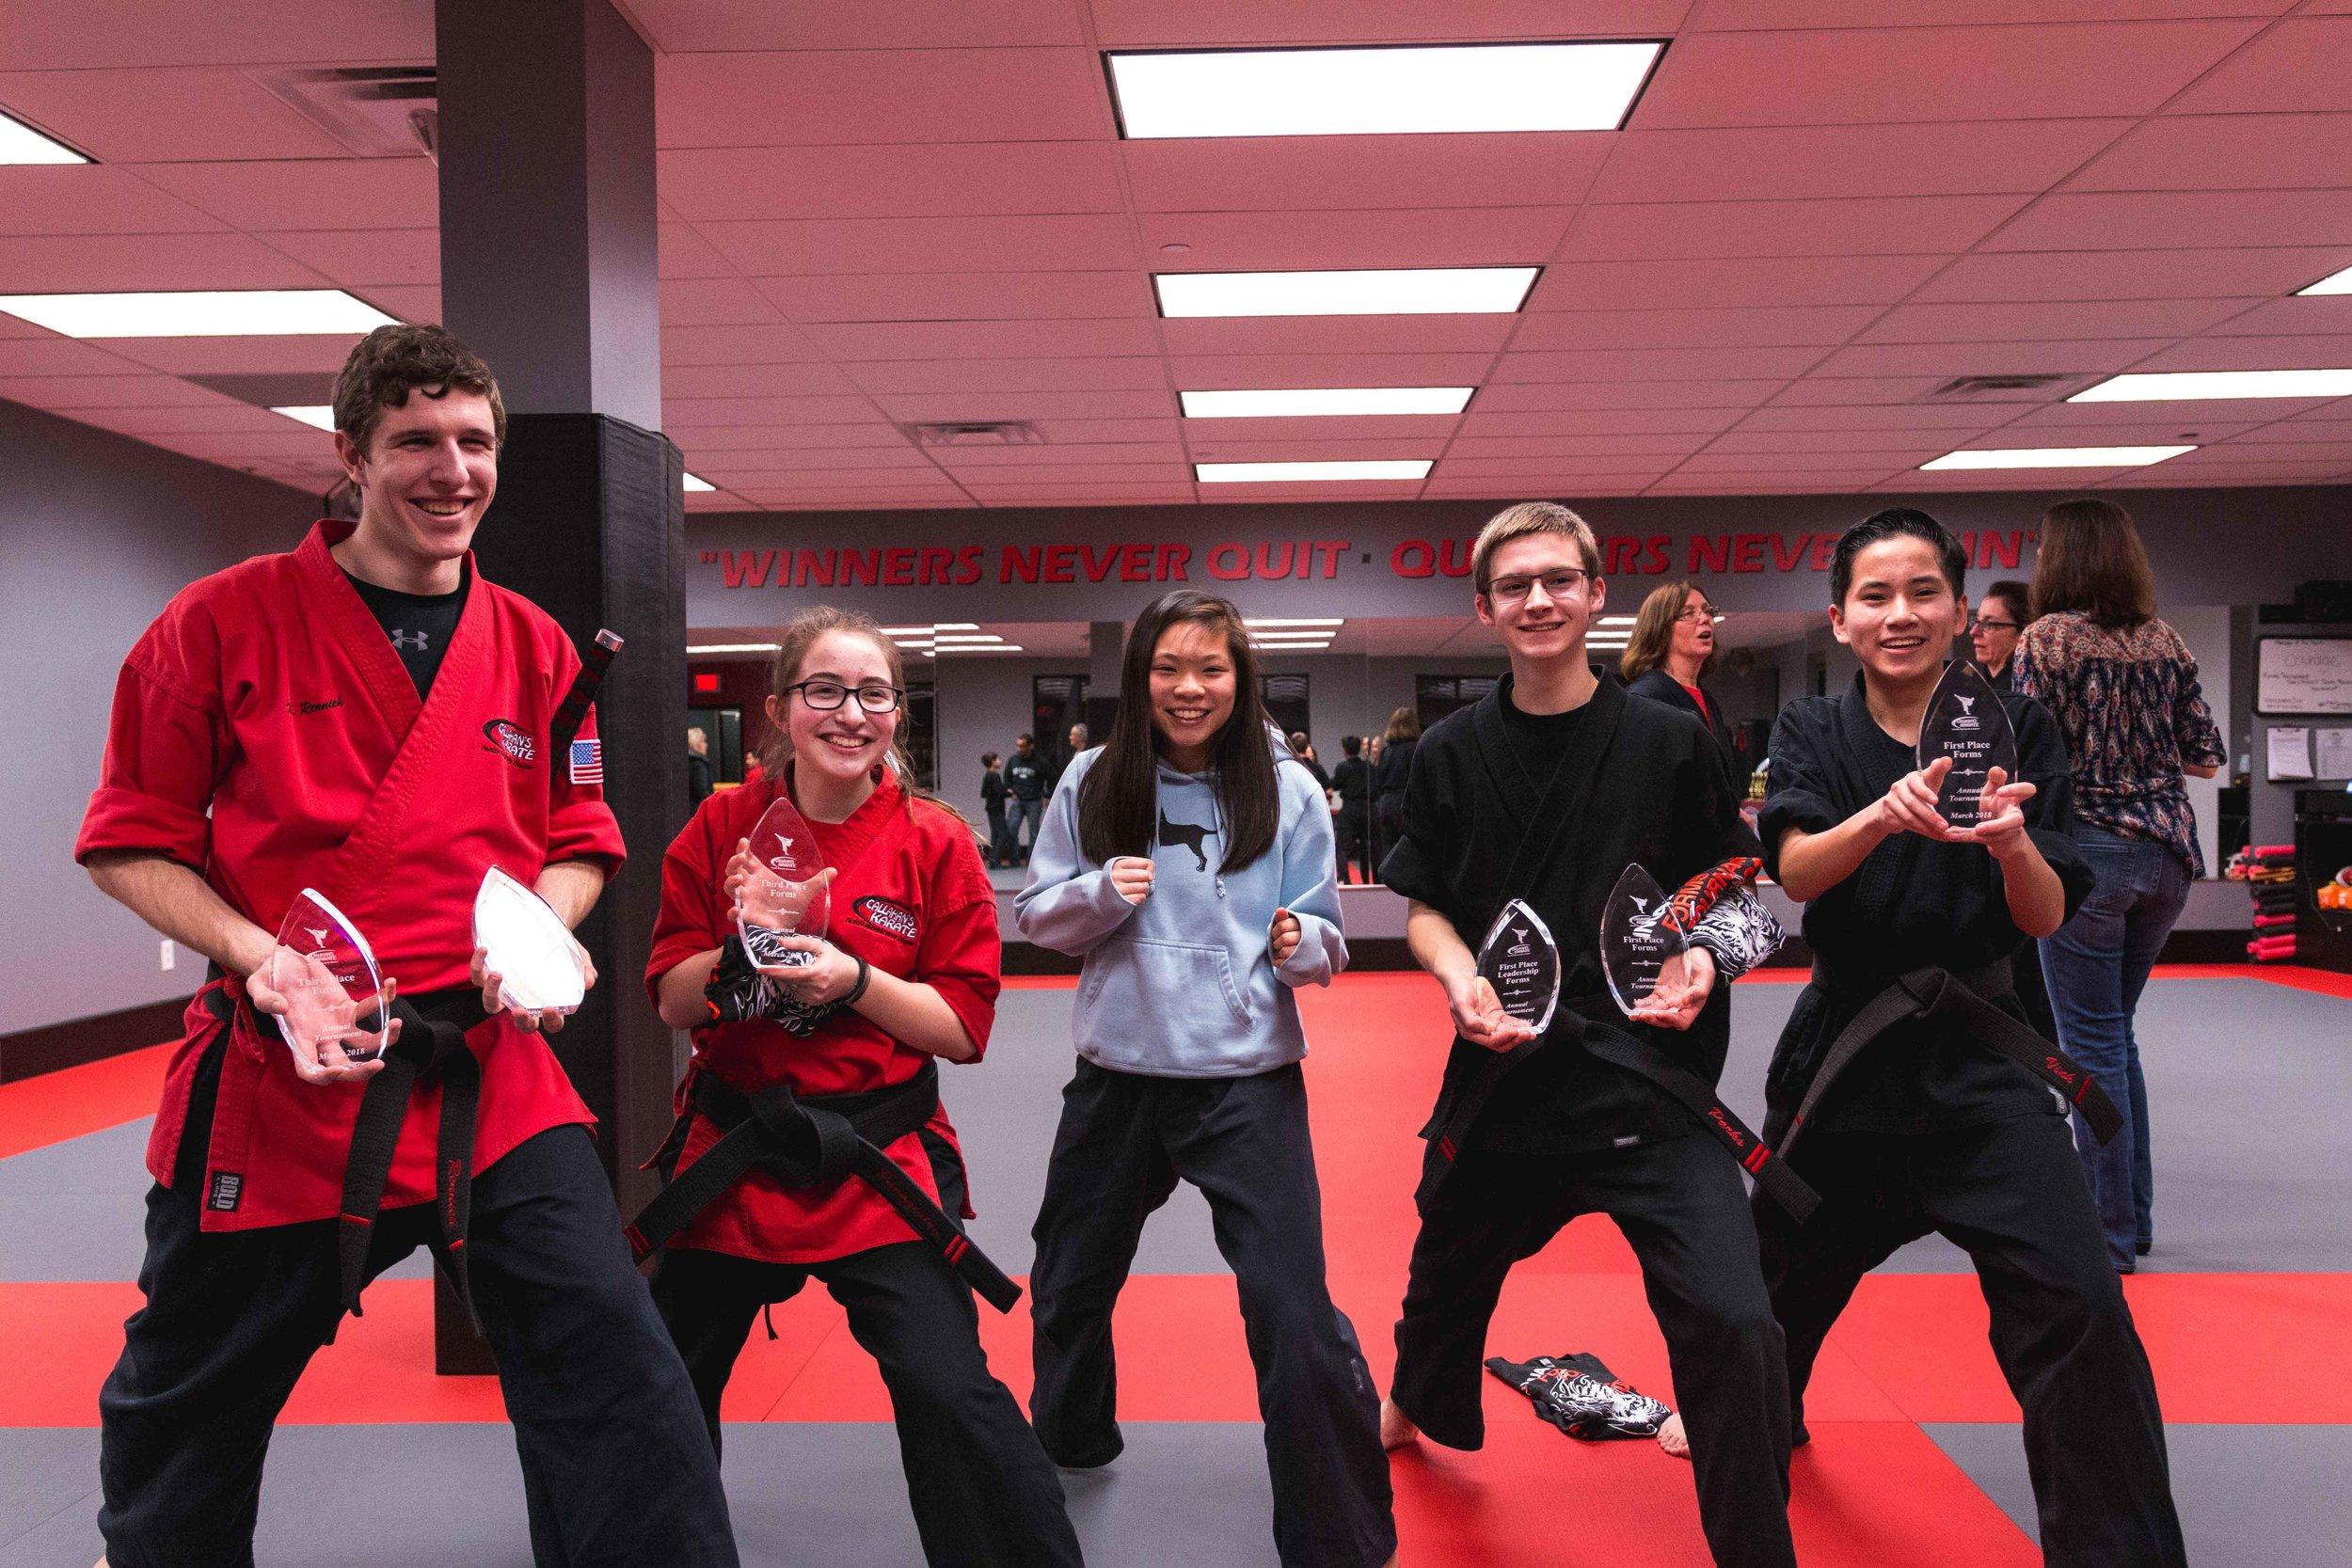 Teenage Karate Classes for Girls and Boys in Bedford Massachusetts at Callahan's Karate 1.jpg